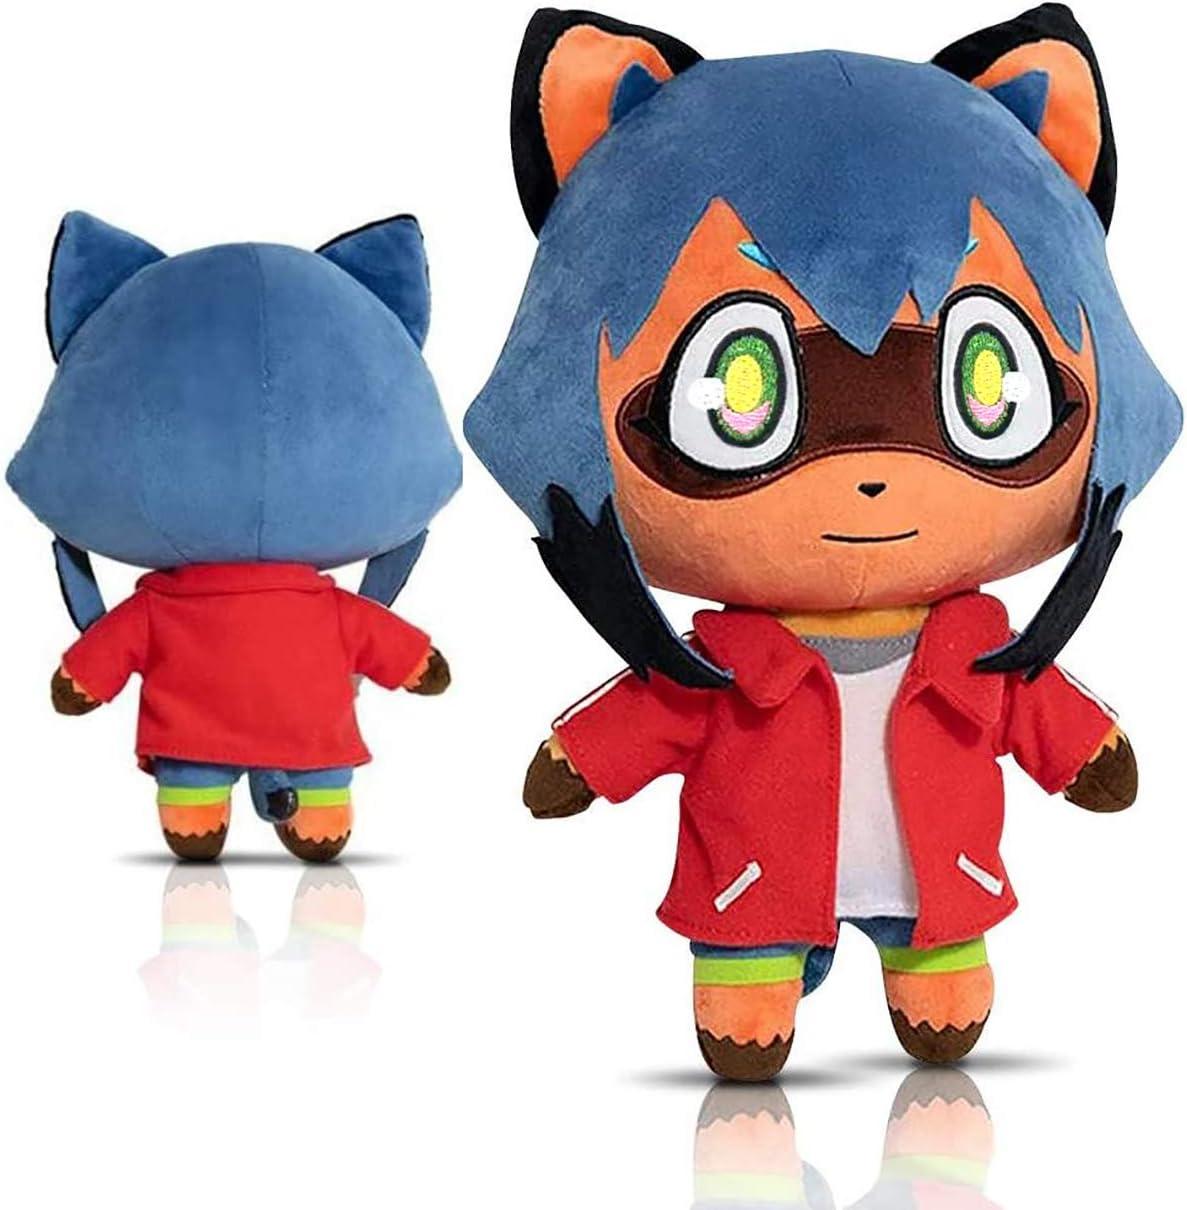 Anime Soft Raccoon Plush Toy, Stuffed Animal Plush Doll Cartoon Figure Soft Sleeping Cuddle Buddy,Bedding, Decoration, Kawaii Gift for Kids